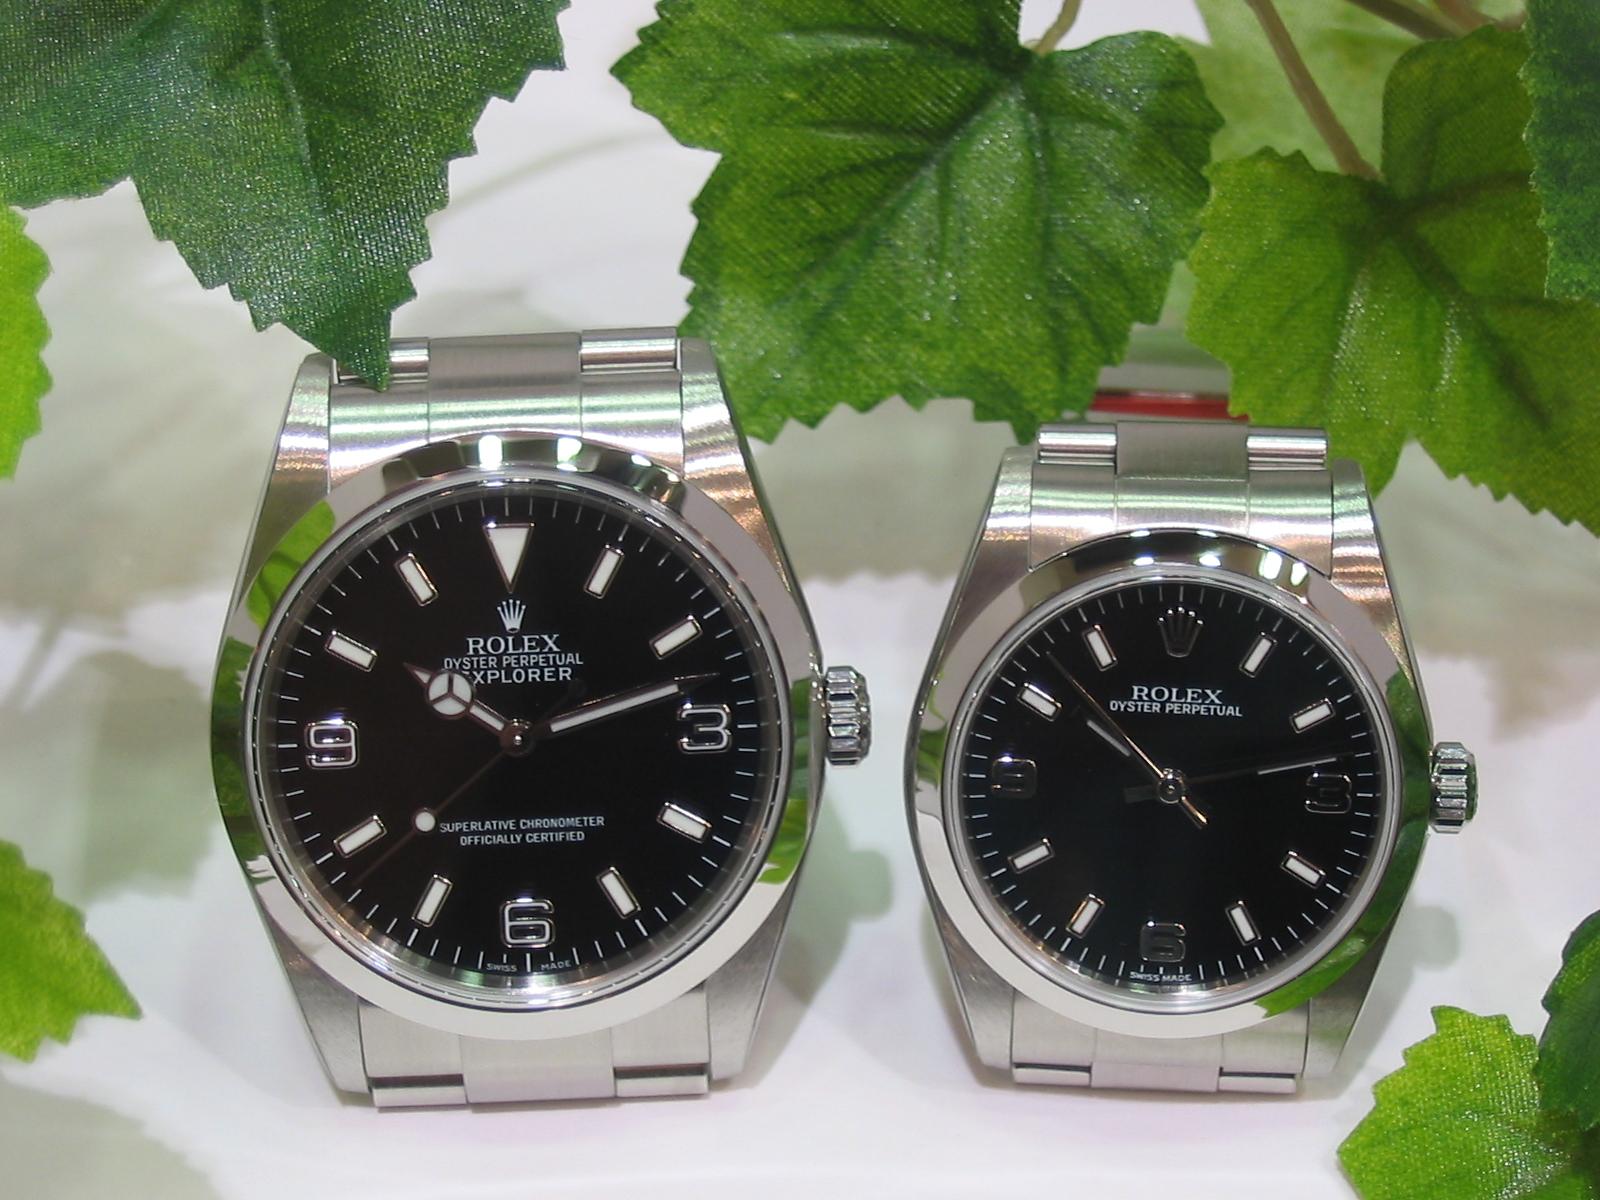 online store c6f35 19977 お揃いカップルにおすすめ!ペア腕時計の人気ブランドランキング ...